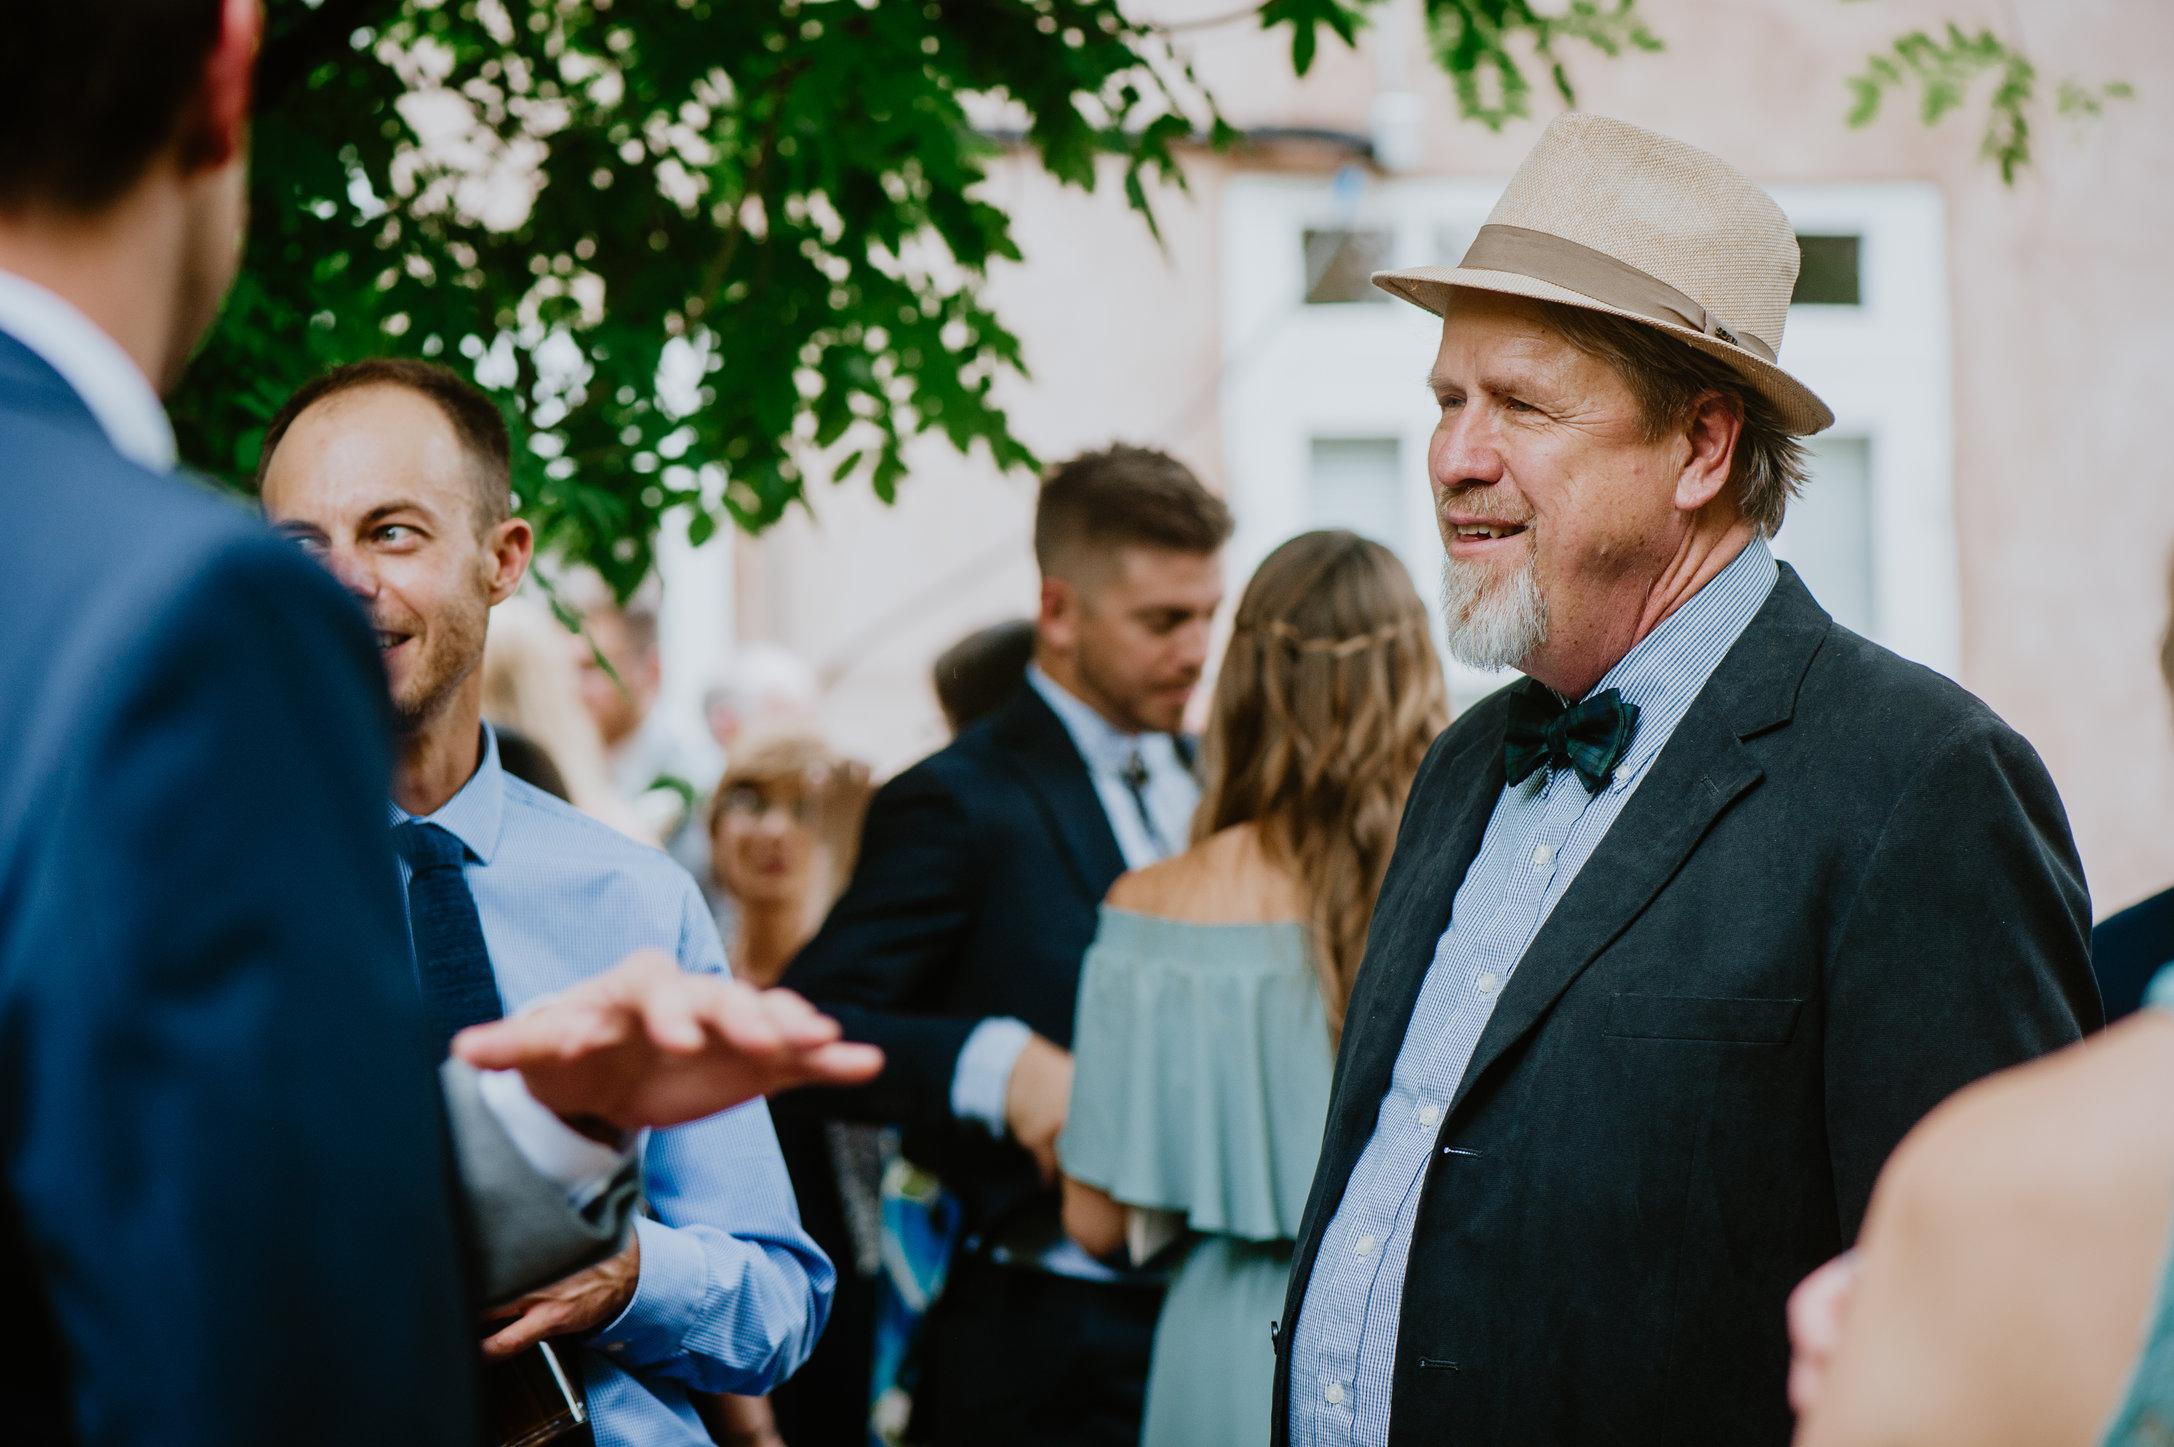 DandA-wedding-363.jpg